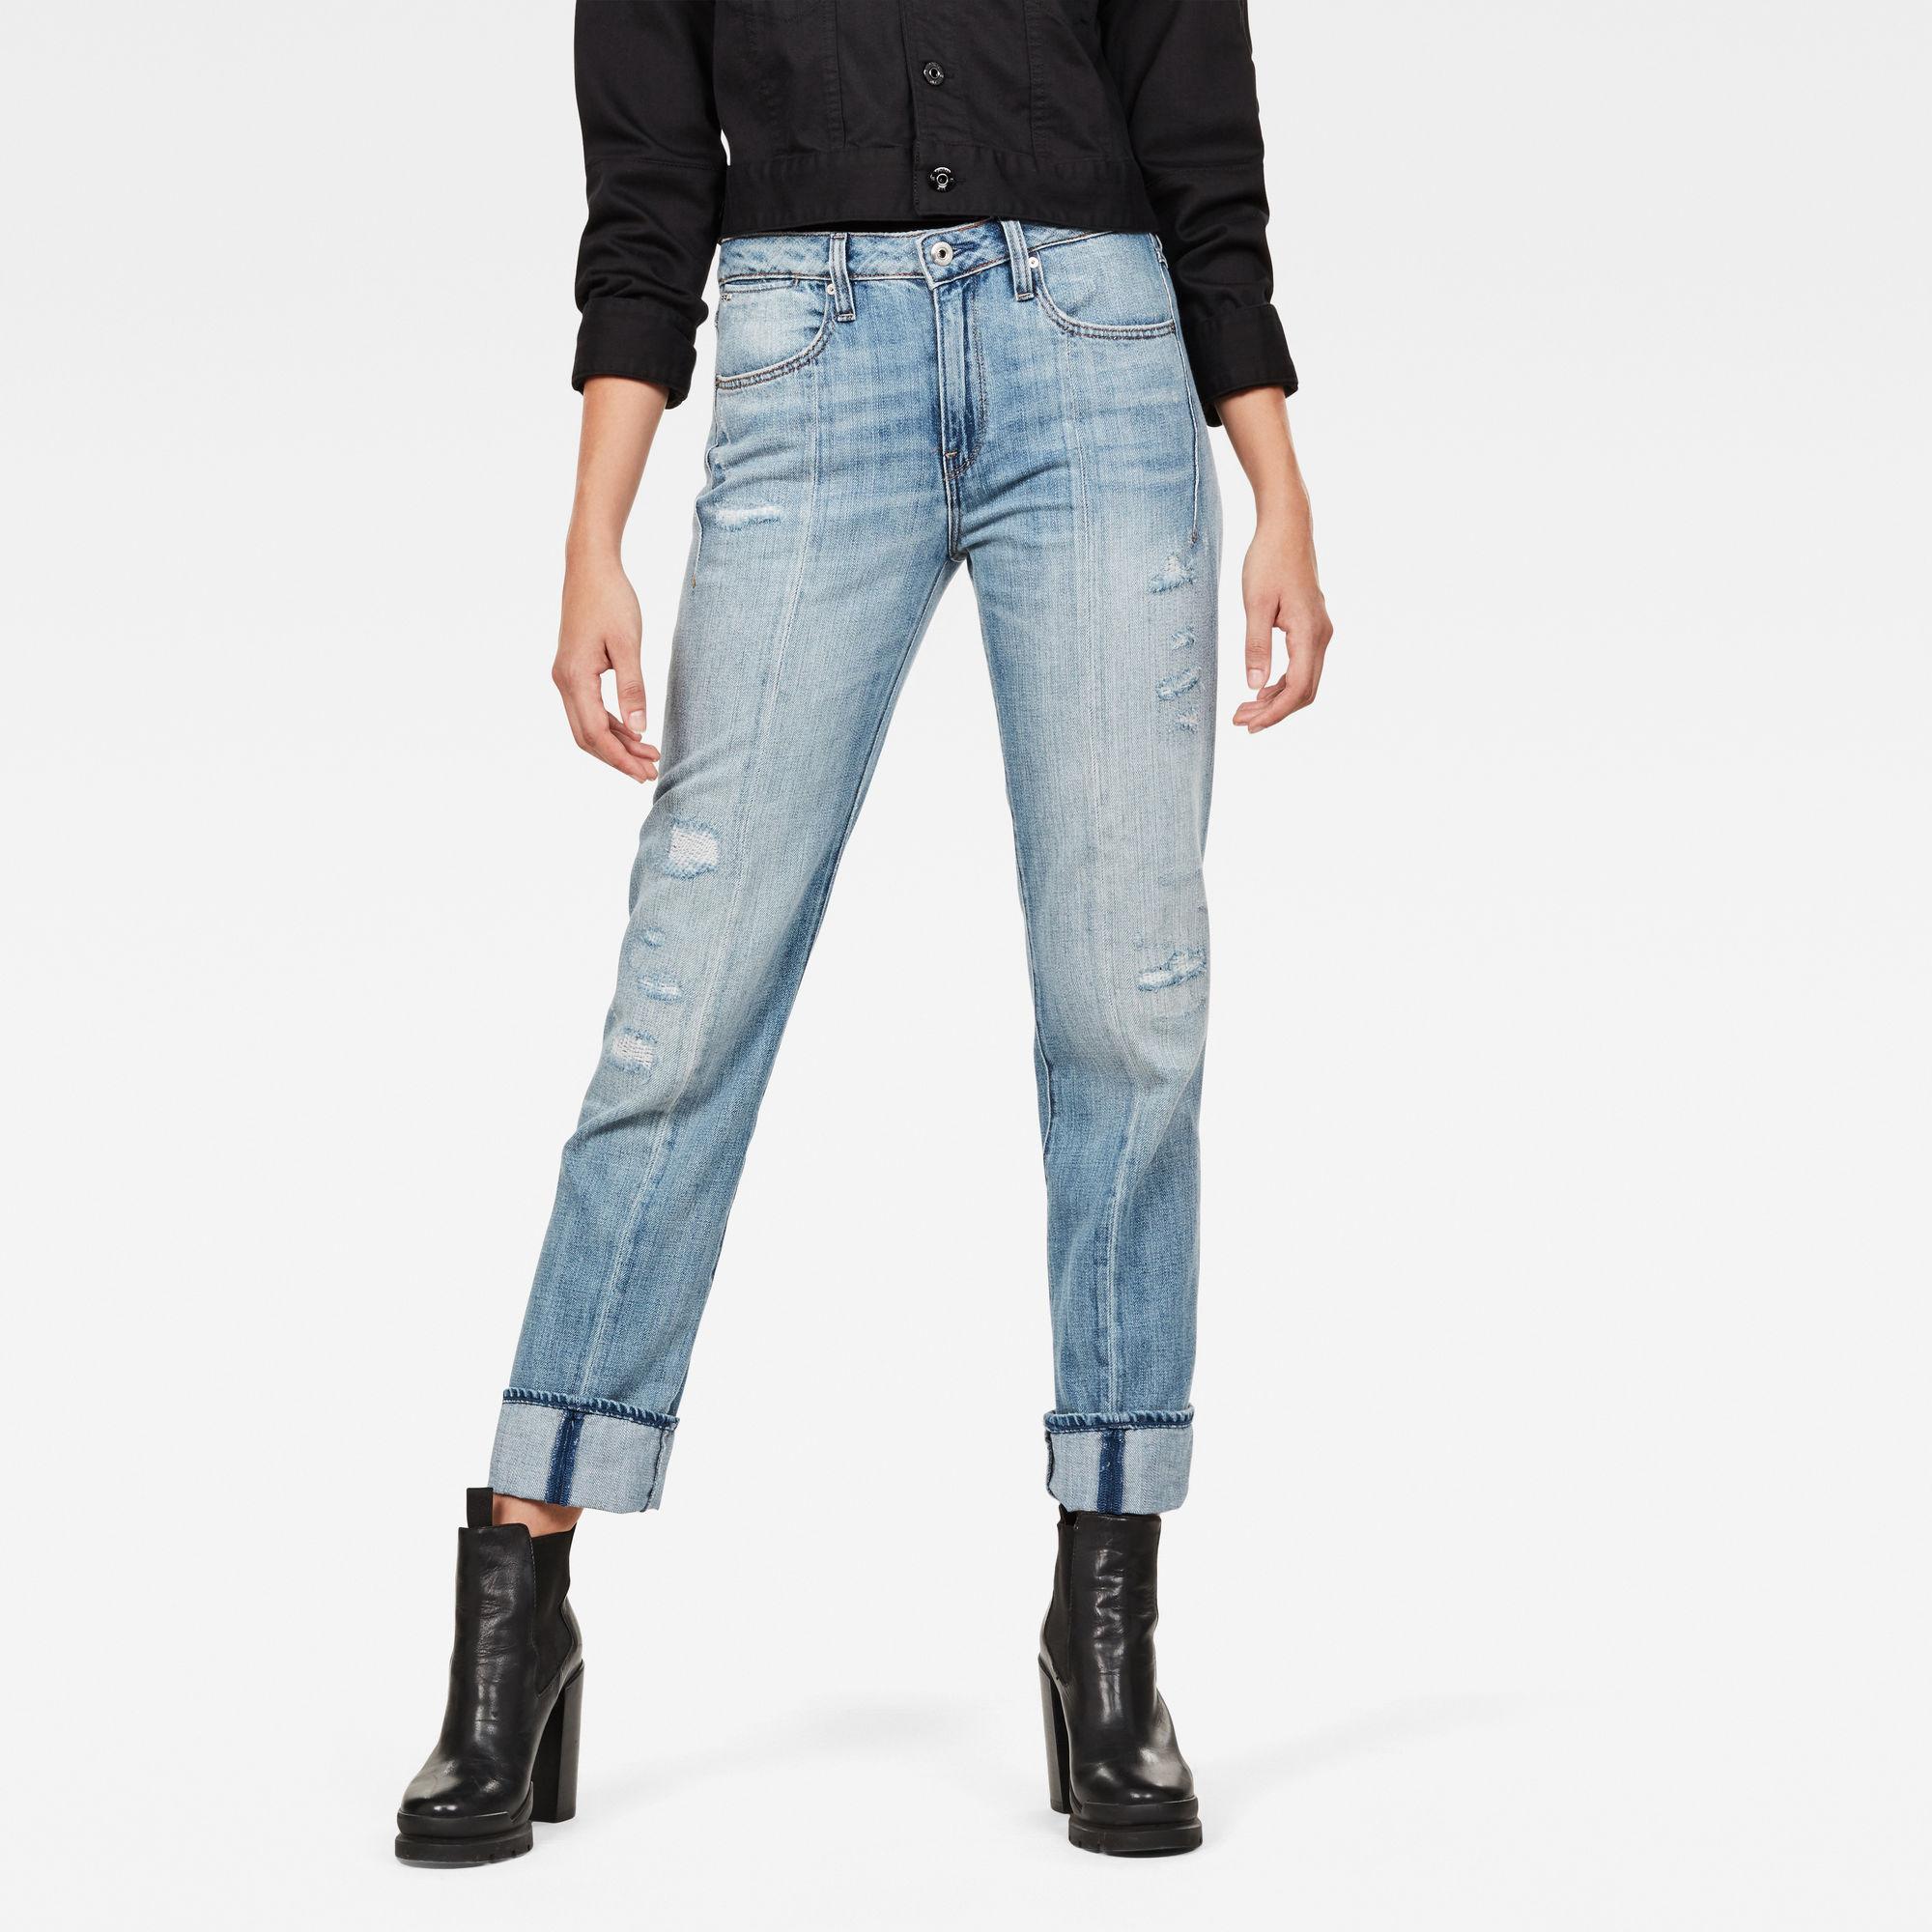 Image of G Star Raw Lanc 3D High Waist Straight Jeans